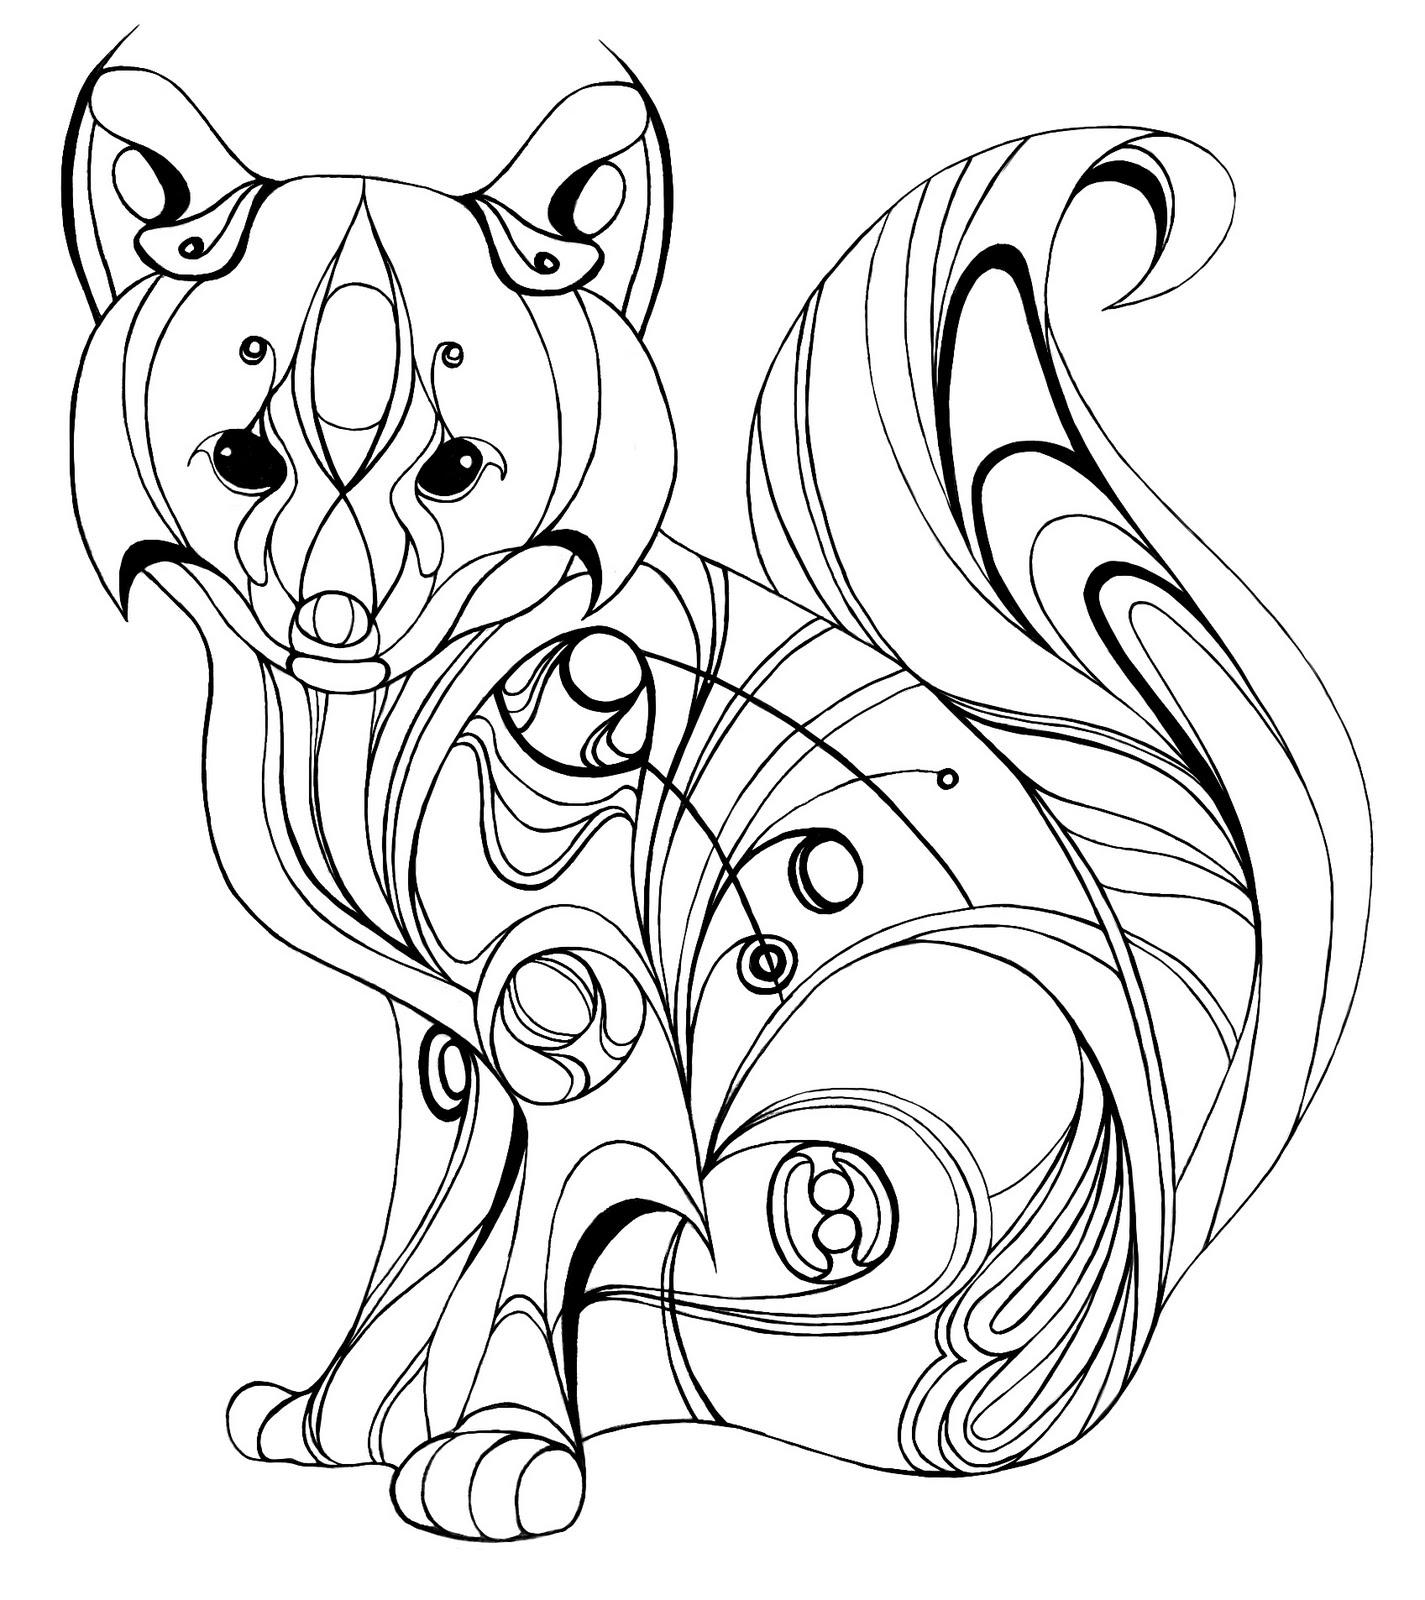 How To Draw O Fox